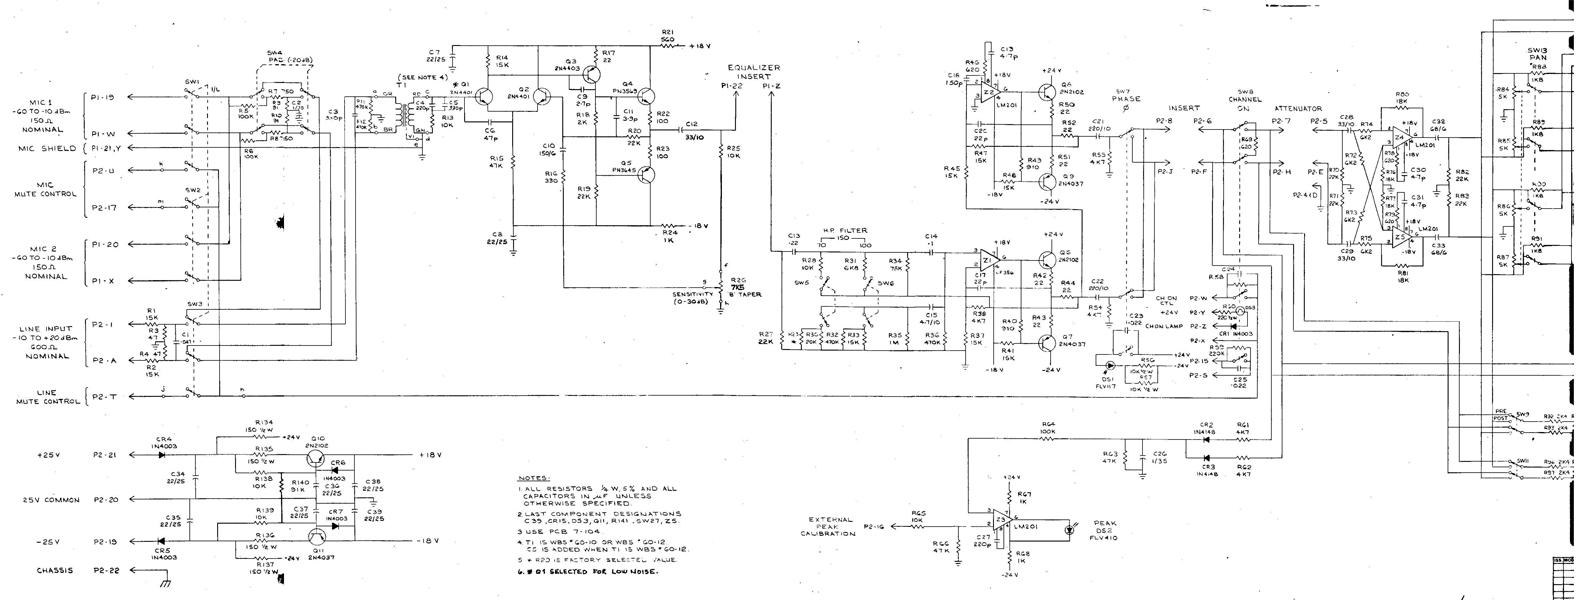 gl1500 cb mic wiring diagram cx500 wiring diagram wiring